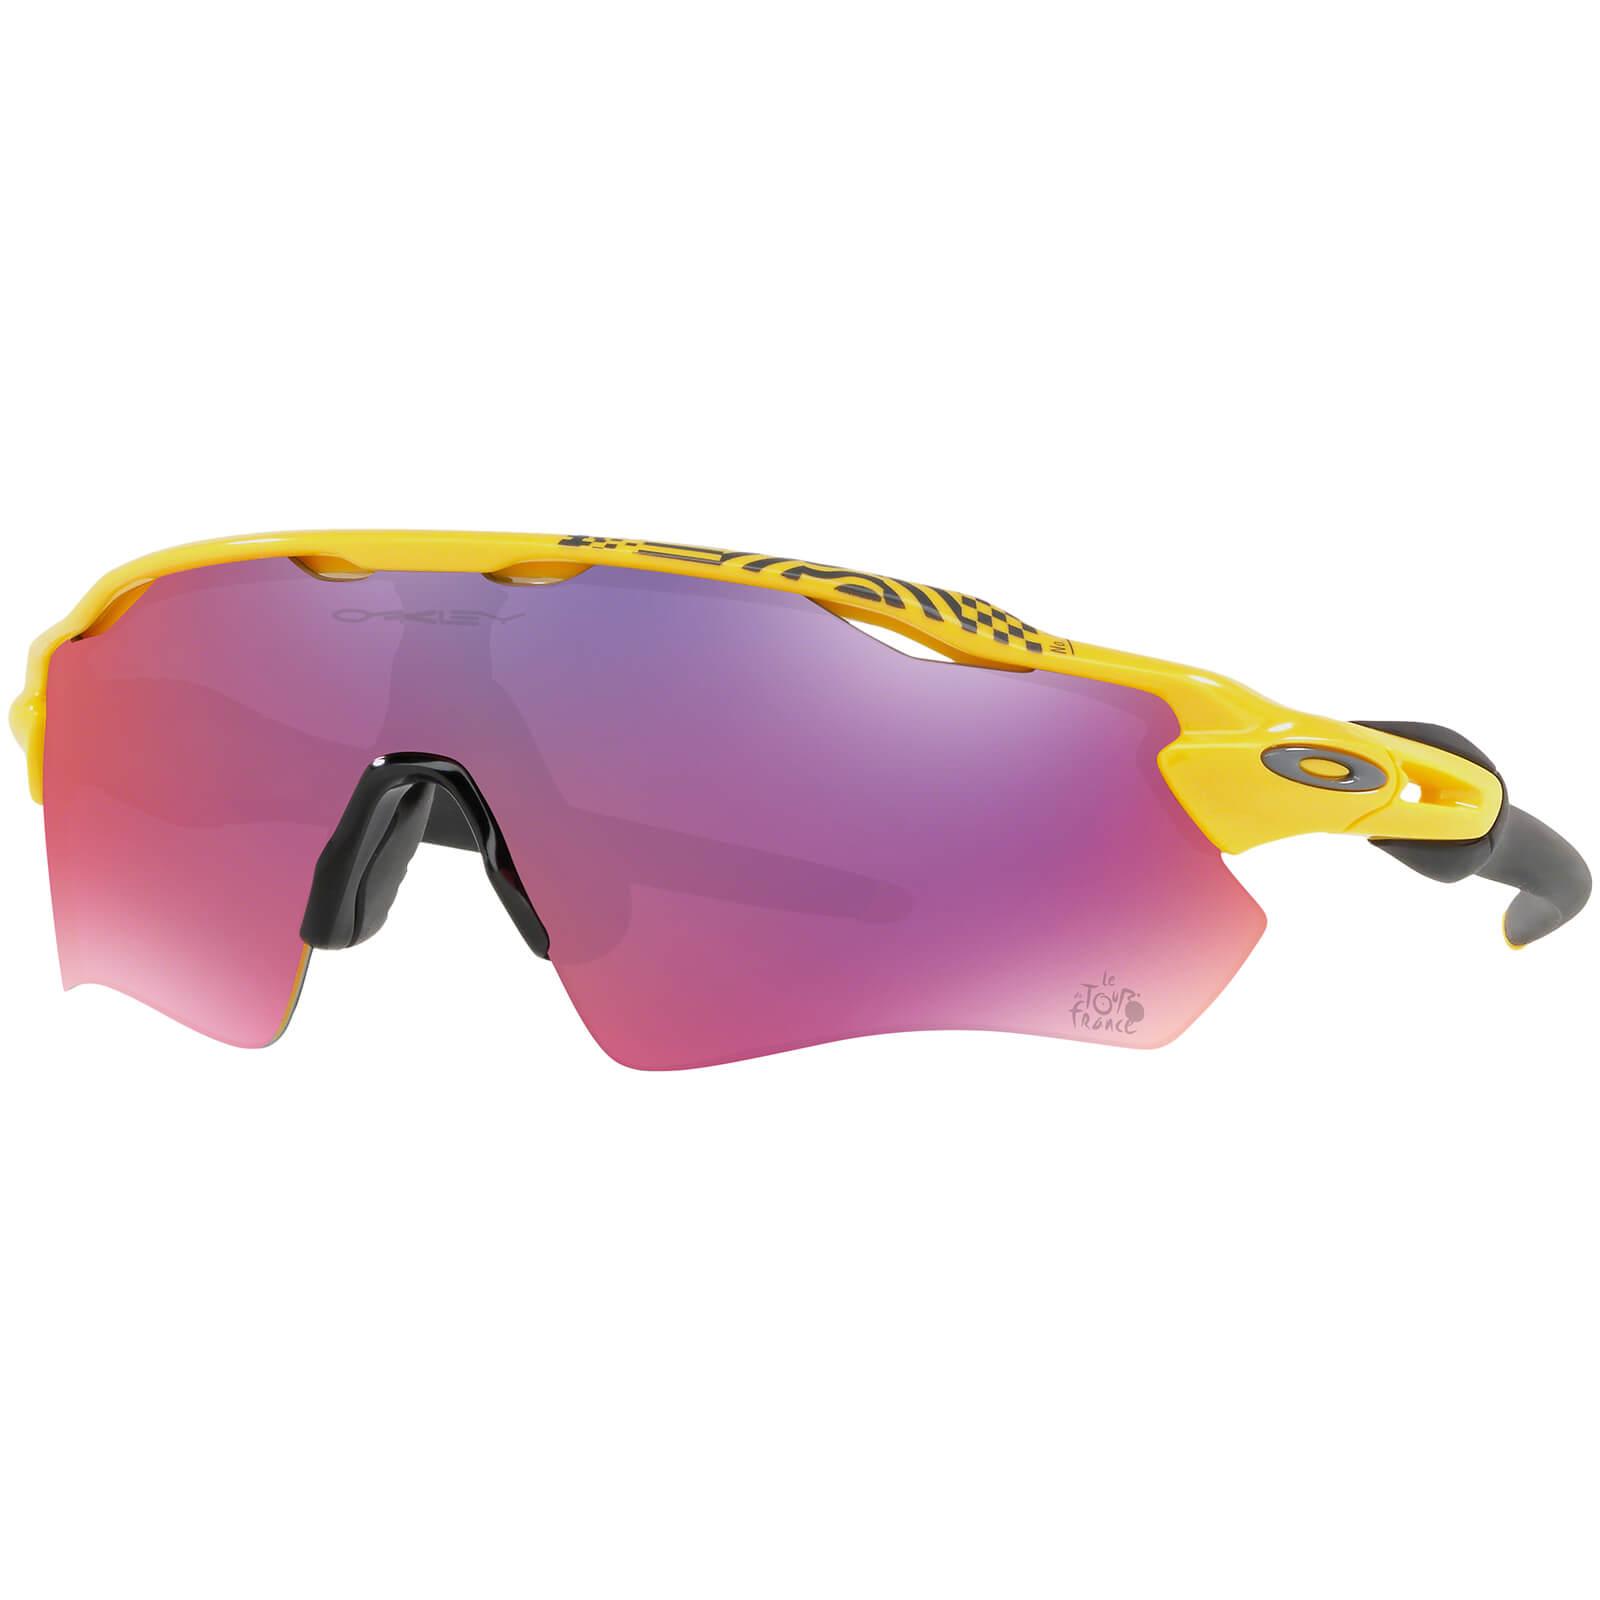 59f9fadc30 Oakley Radar EV Path Tour de France Limited Edition Sunglasses -  Yellow Prizm Road